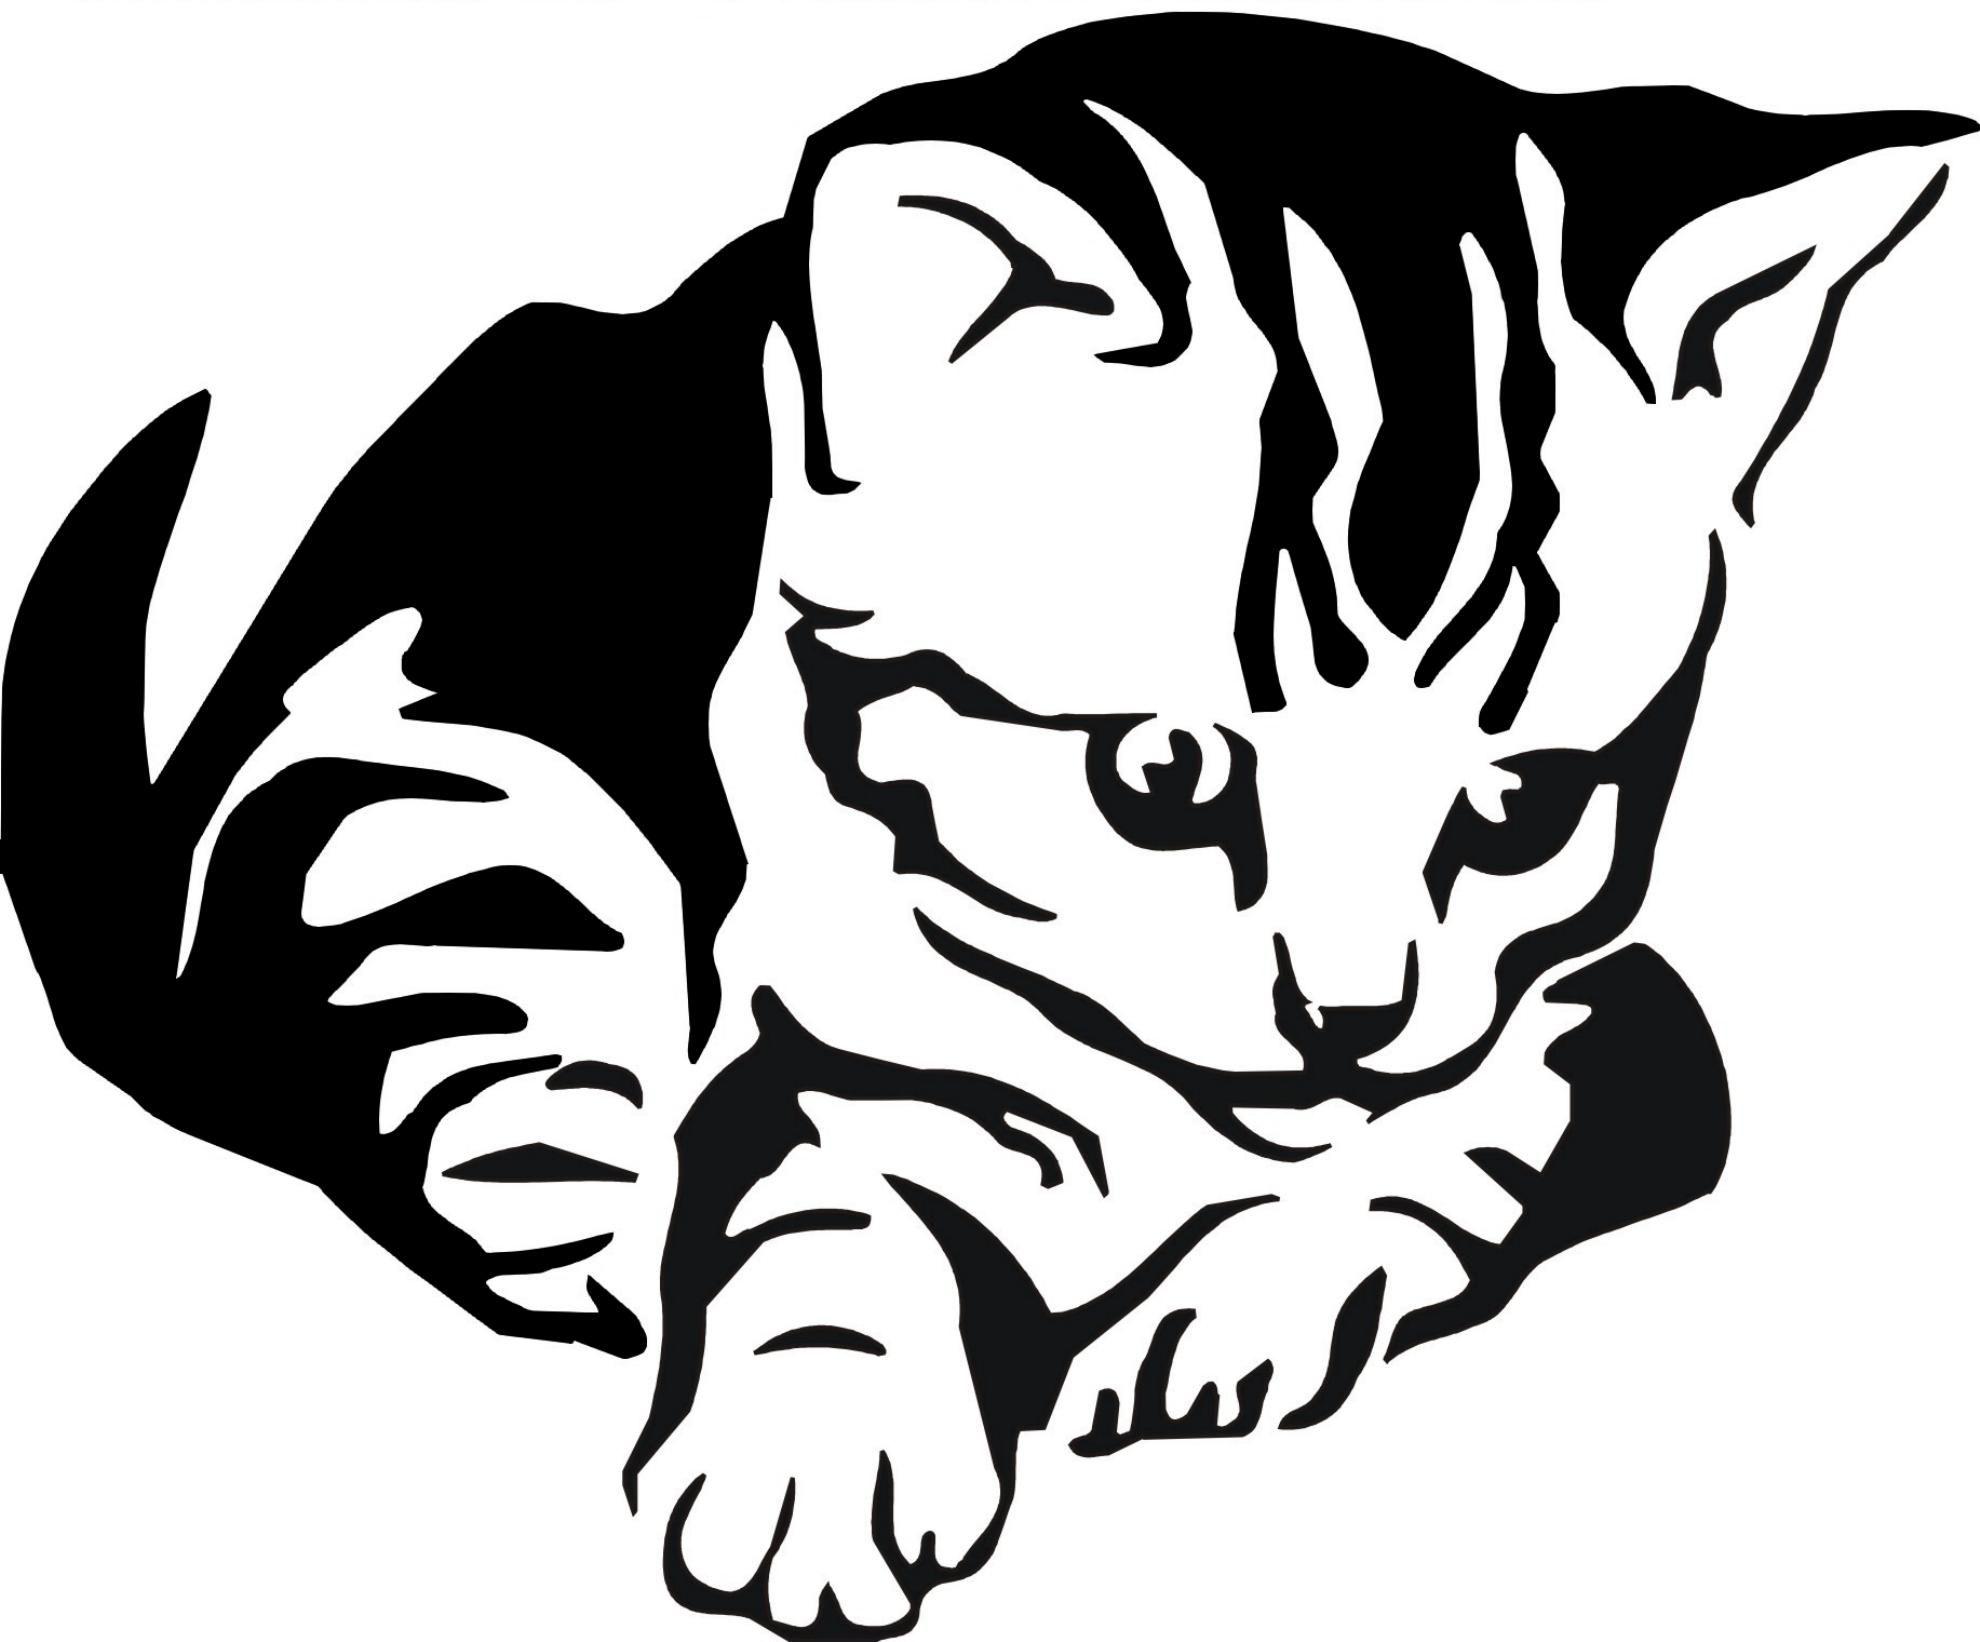 Malvorlage Katze Umriss – tiffanylovesbooks.com